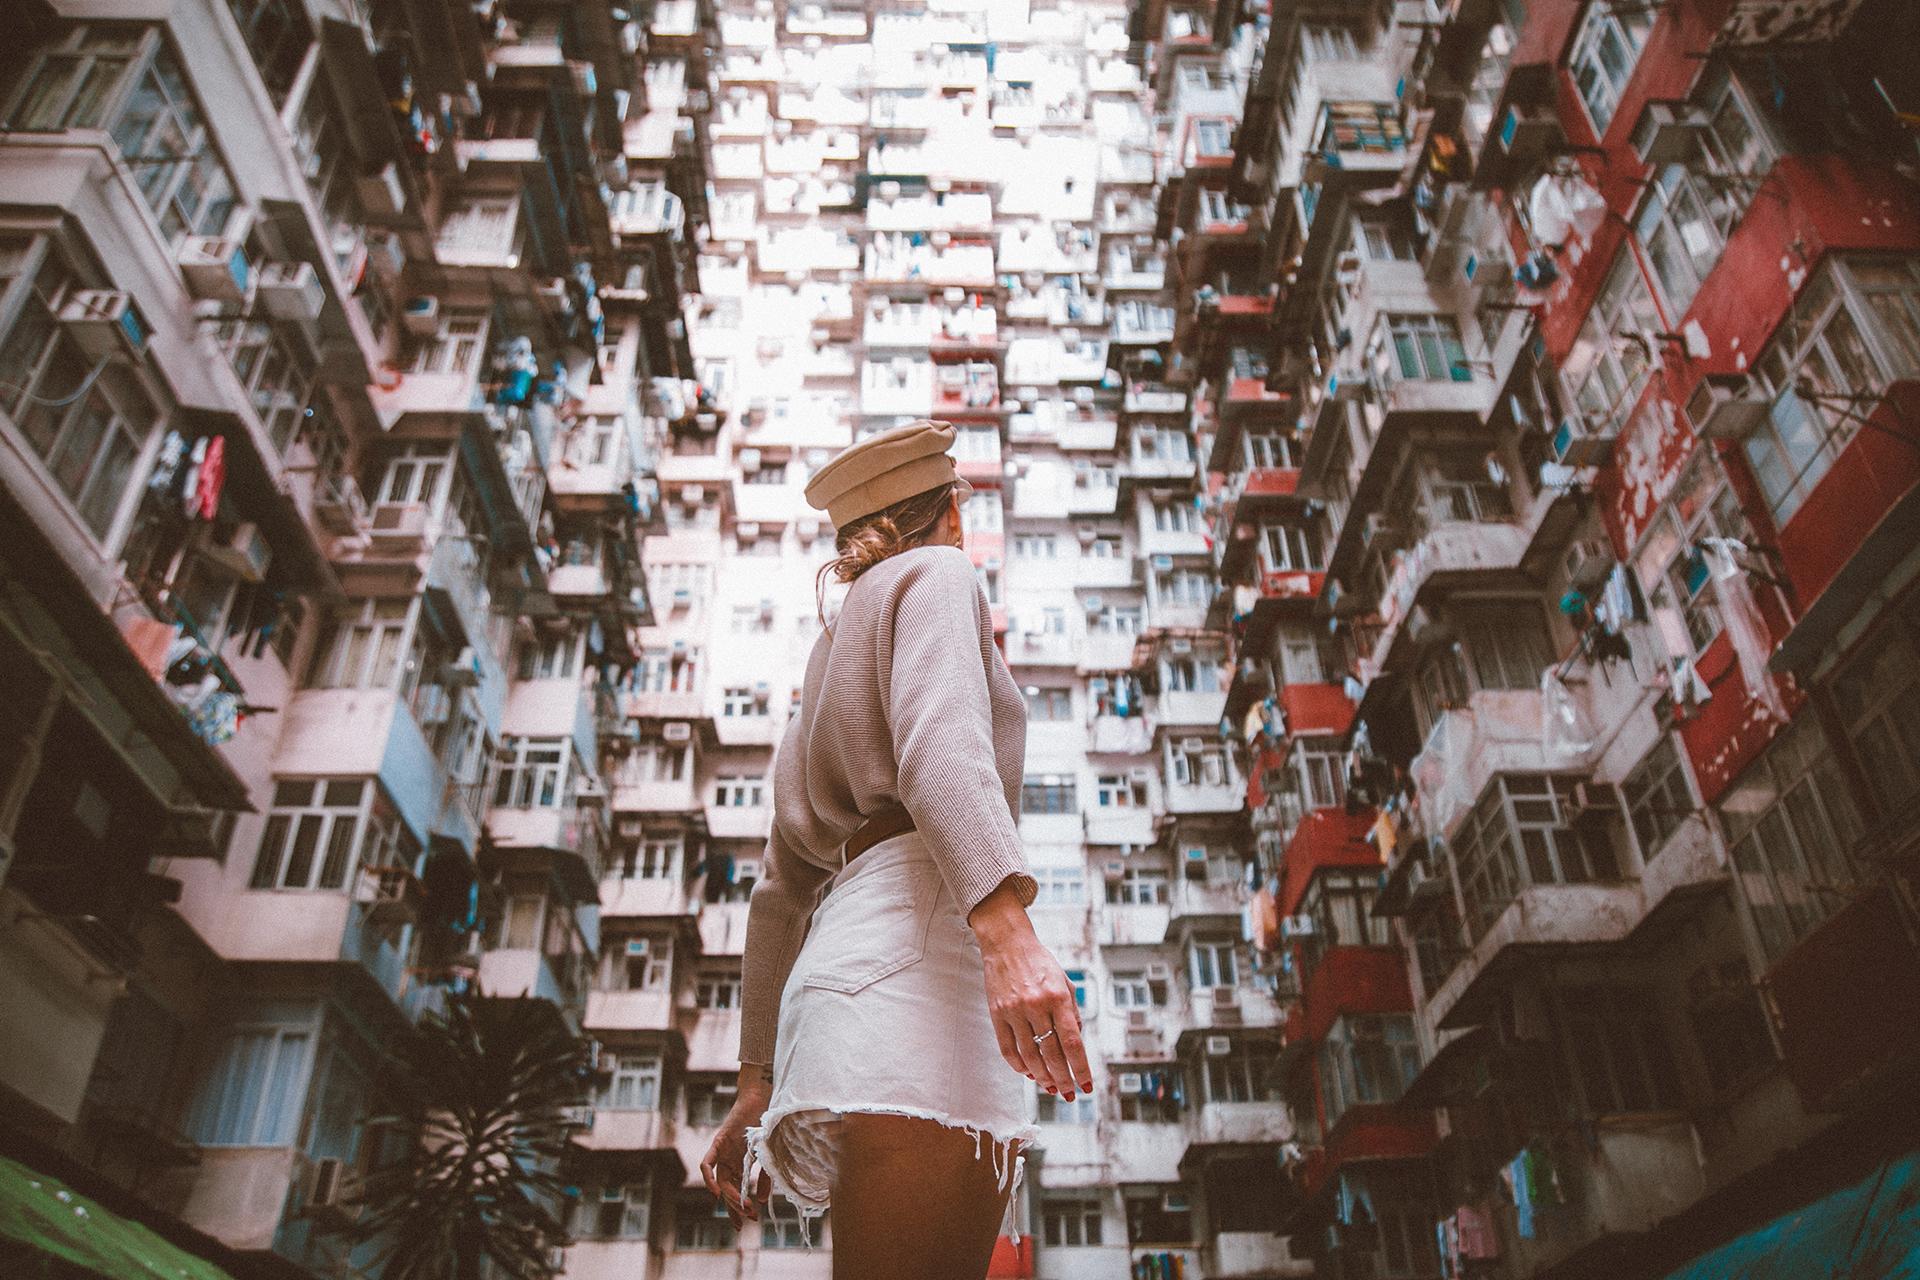 HONG KONG 5-13